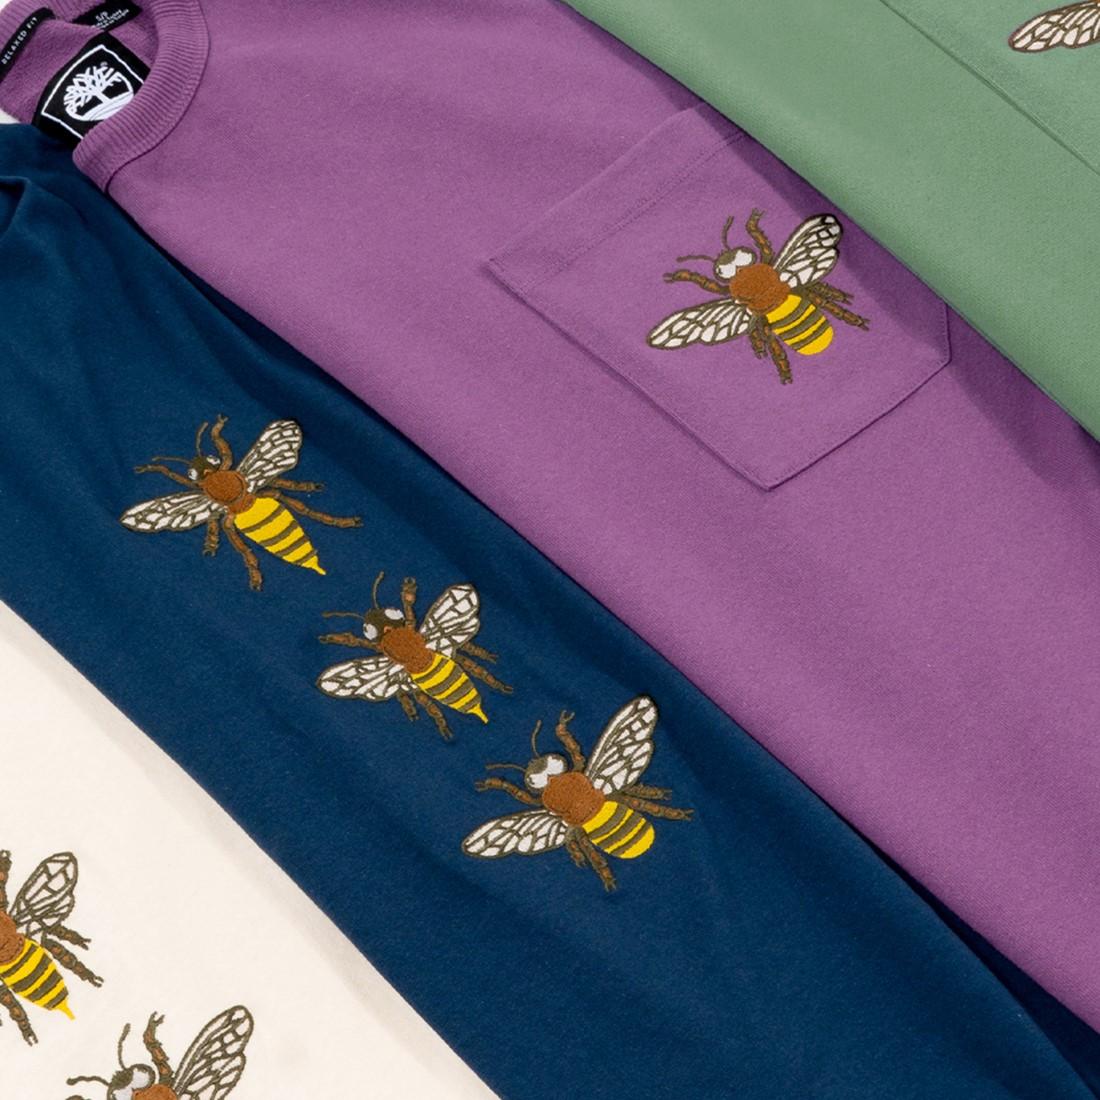 Bee Line By Billionaire Boys Club x Timberland